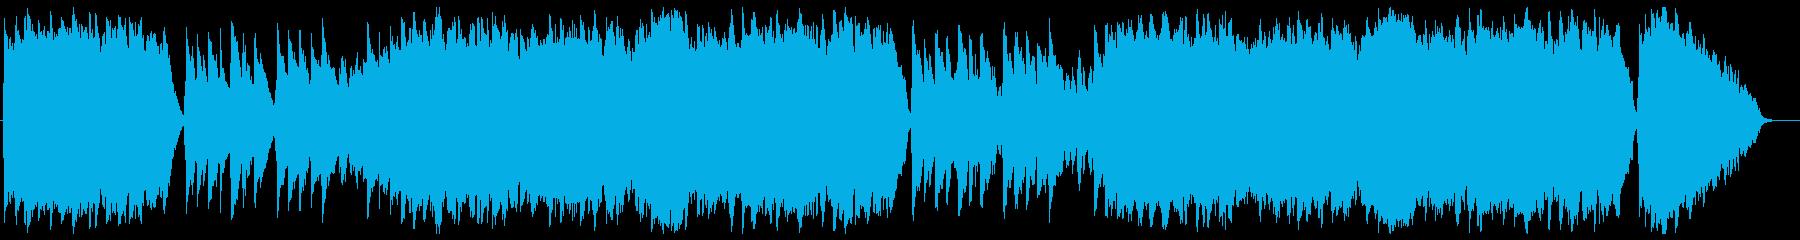 Aura Lee (Love Me Tender Original Song)'s reproduced waveform